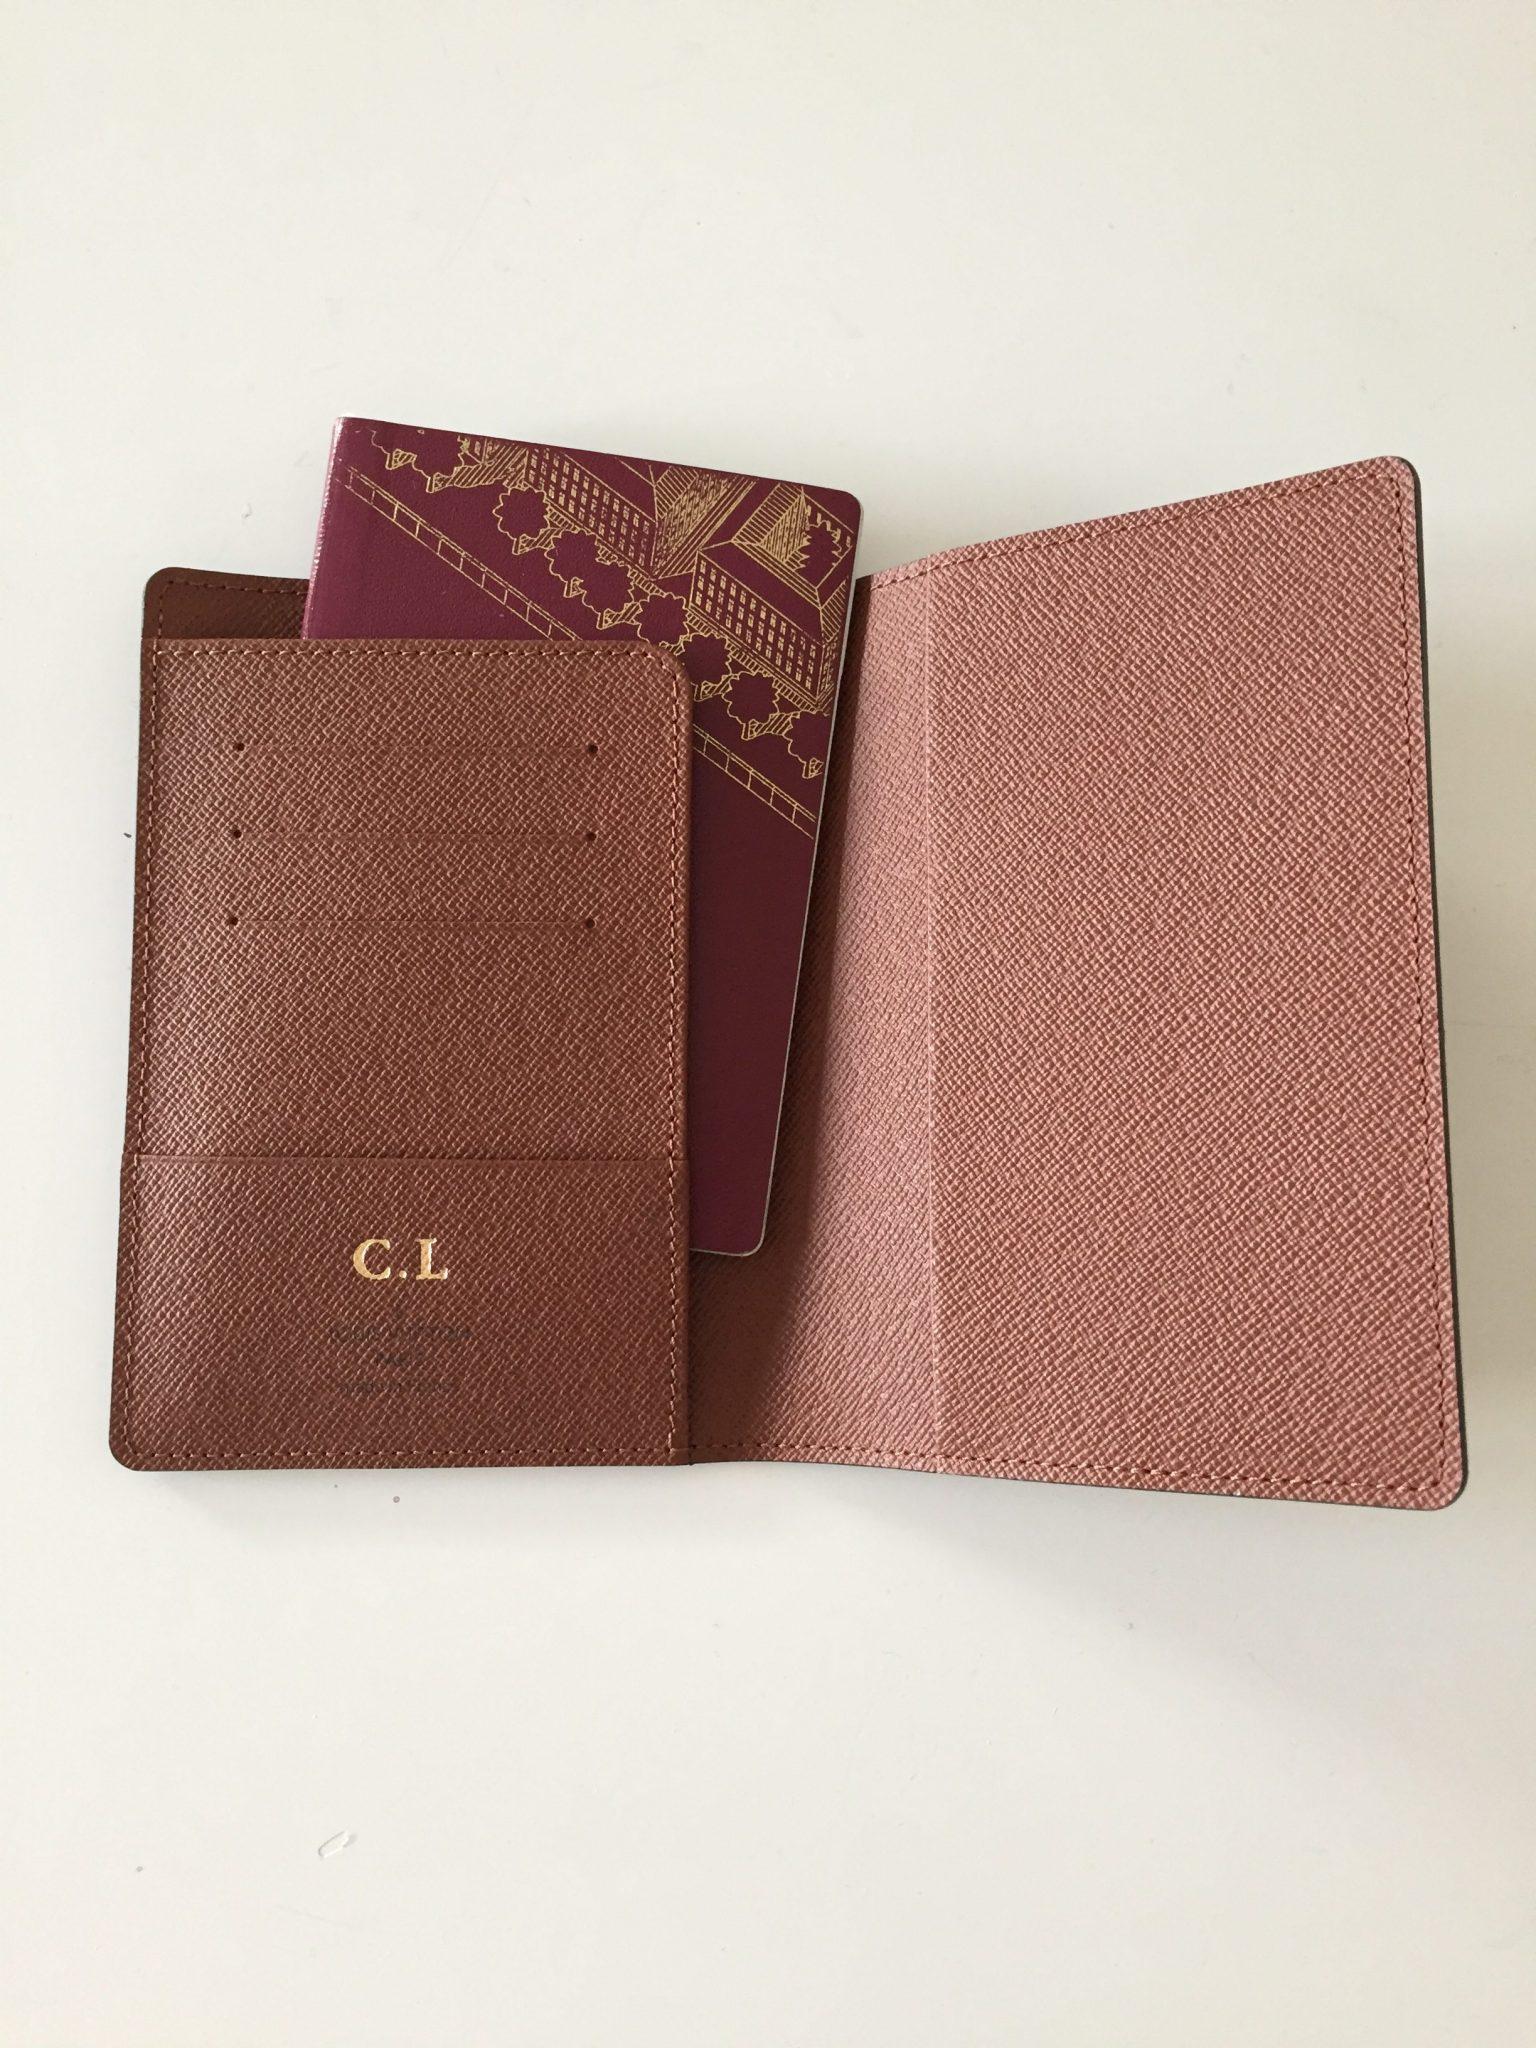 Passfodral från Louis Vuitton